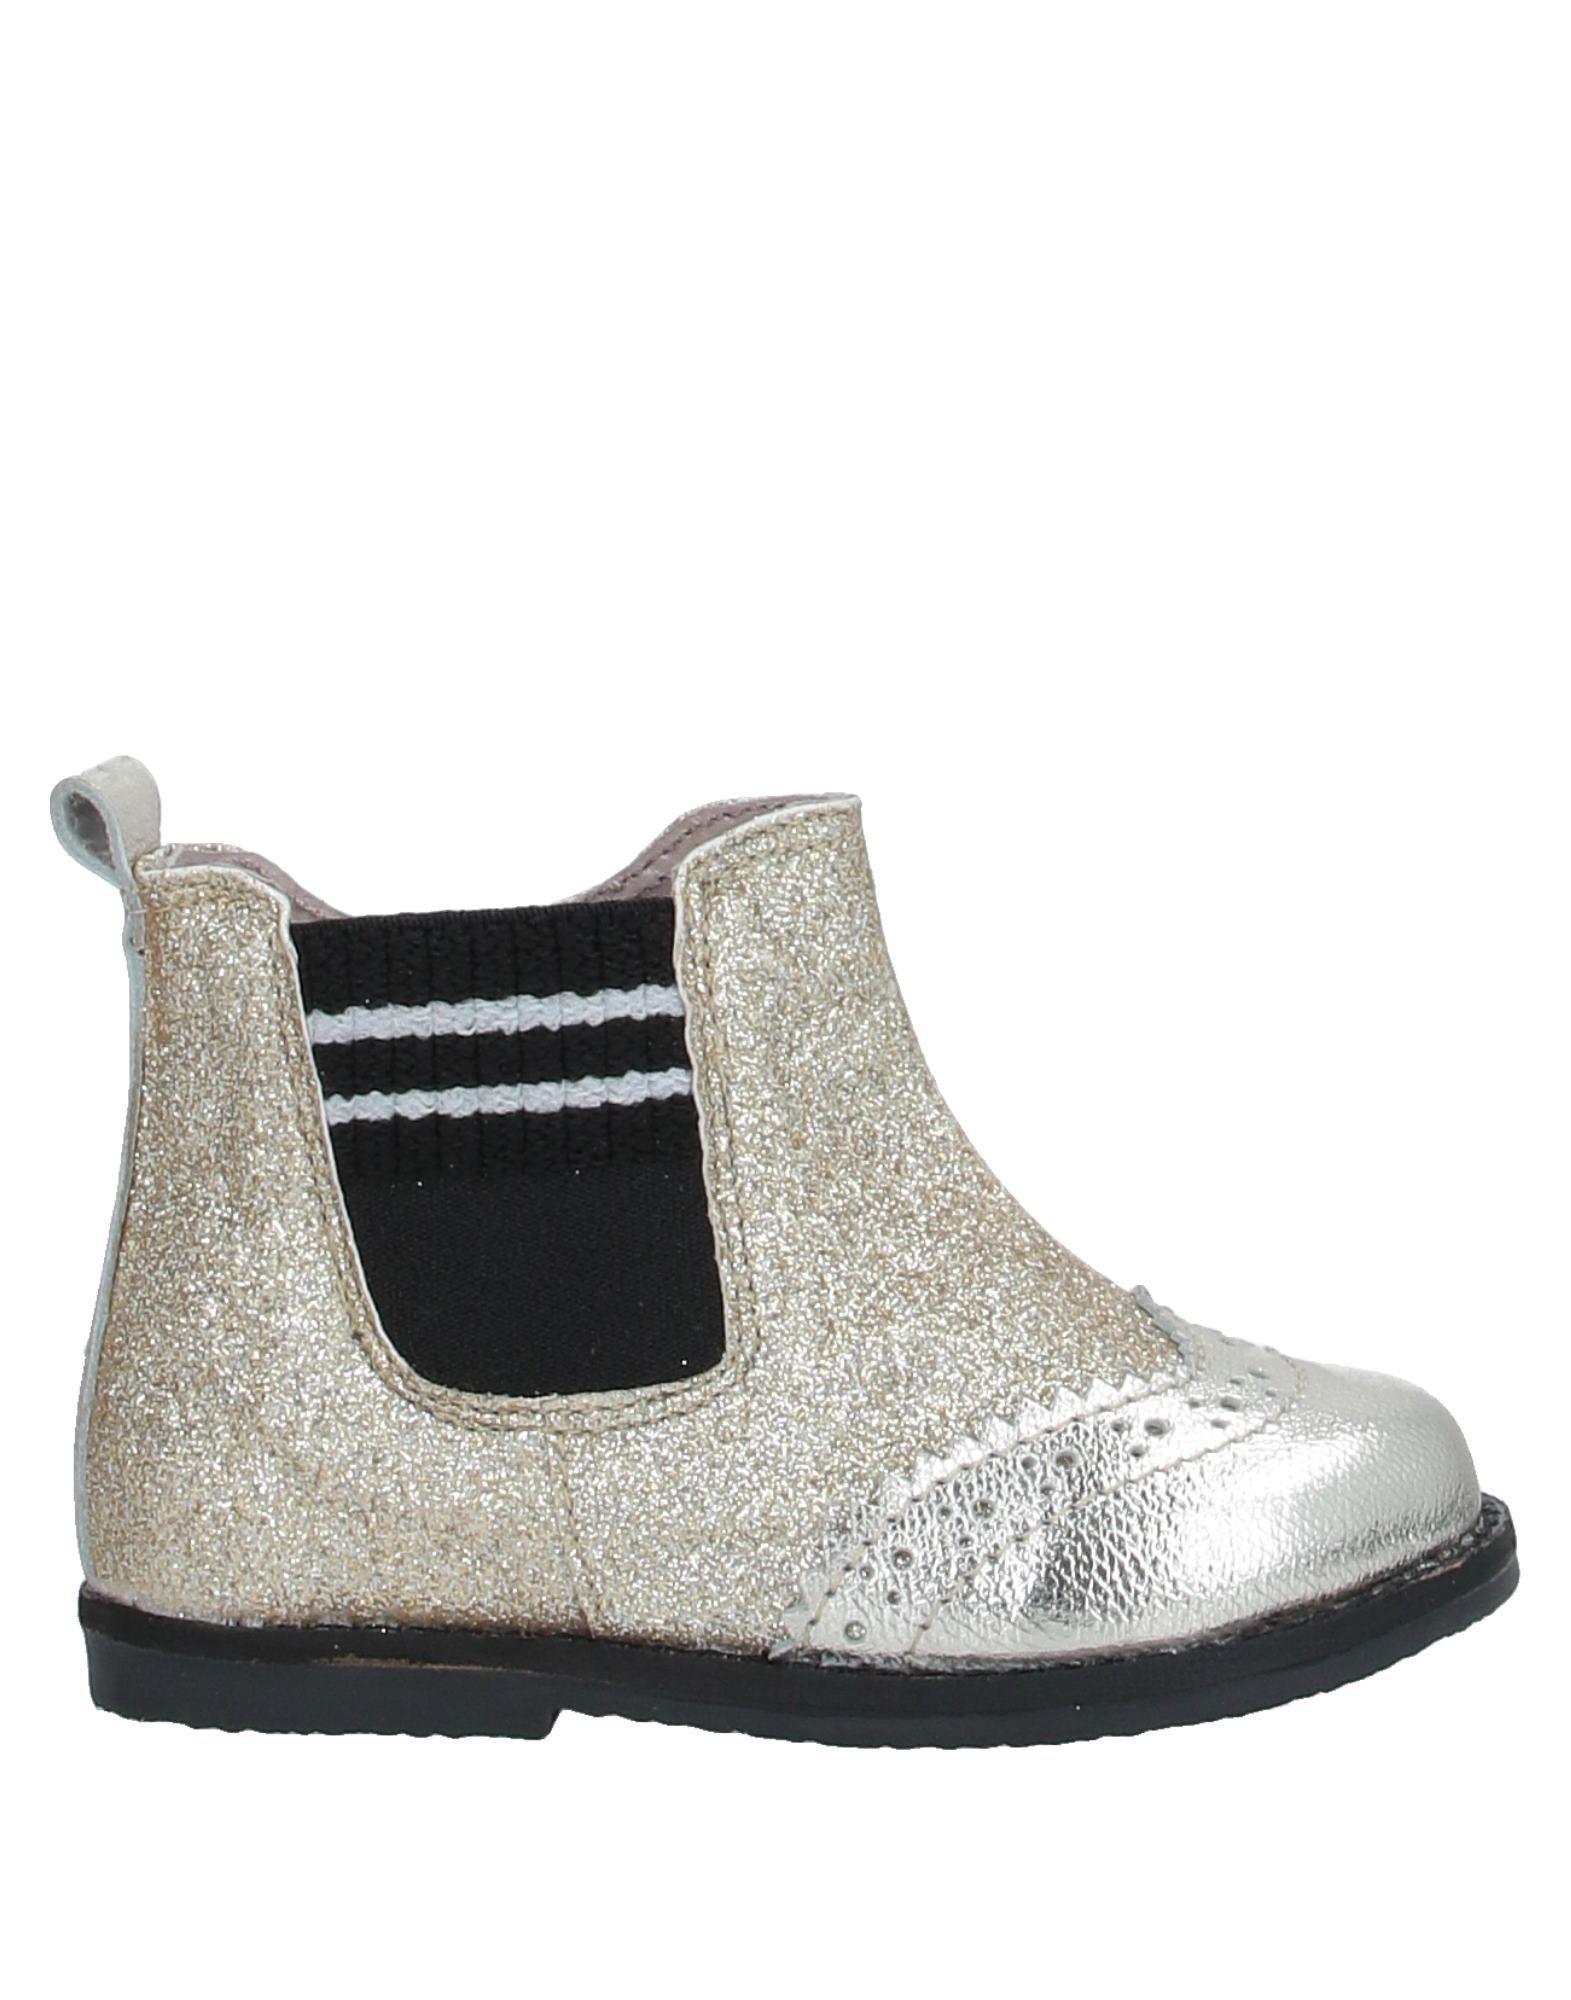 OCA-LOCA   OCA-LOCA Ankle Boots 11722142   Goxip